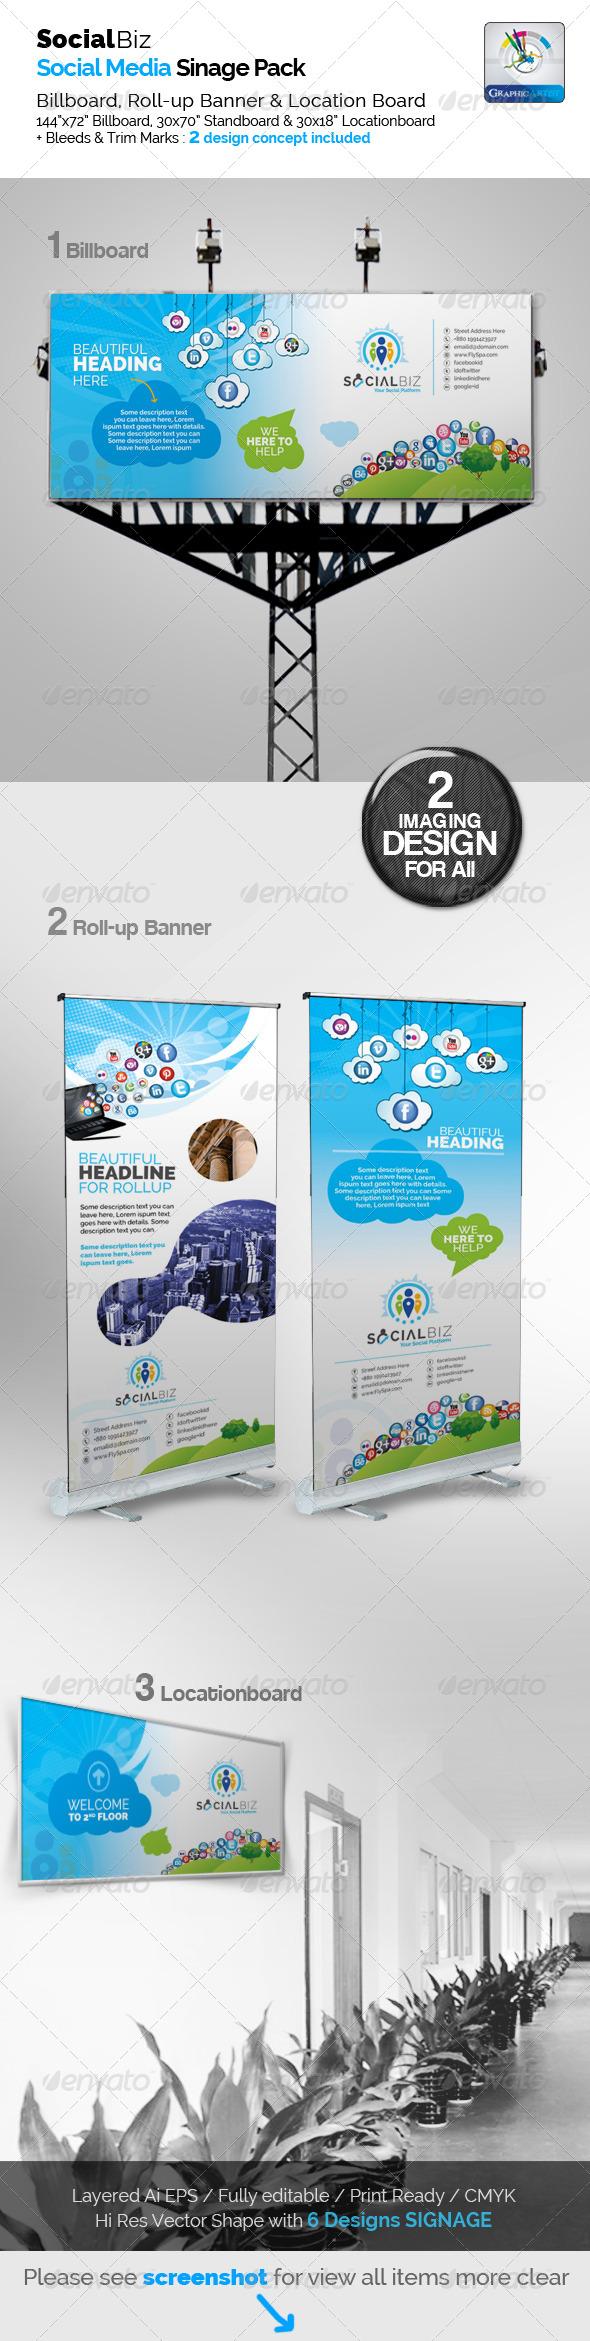 GraphicRiver SocialBiz Clean Social Media Signage Pack 5747603